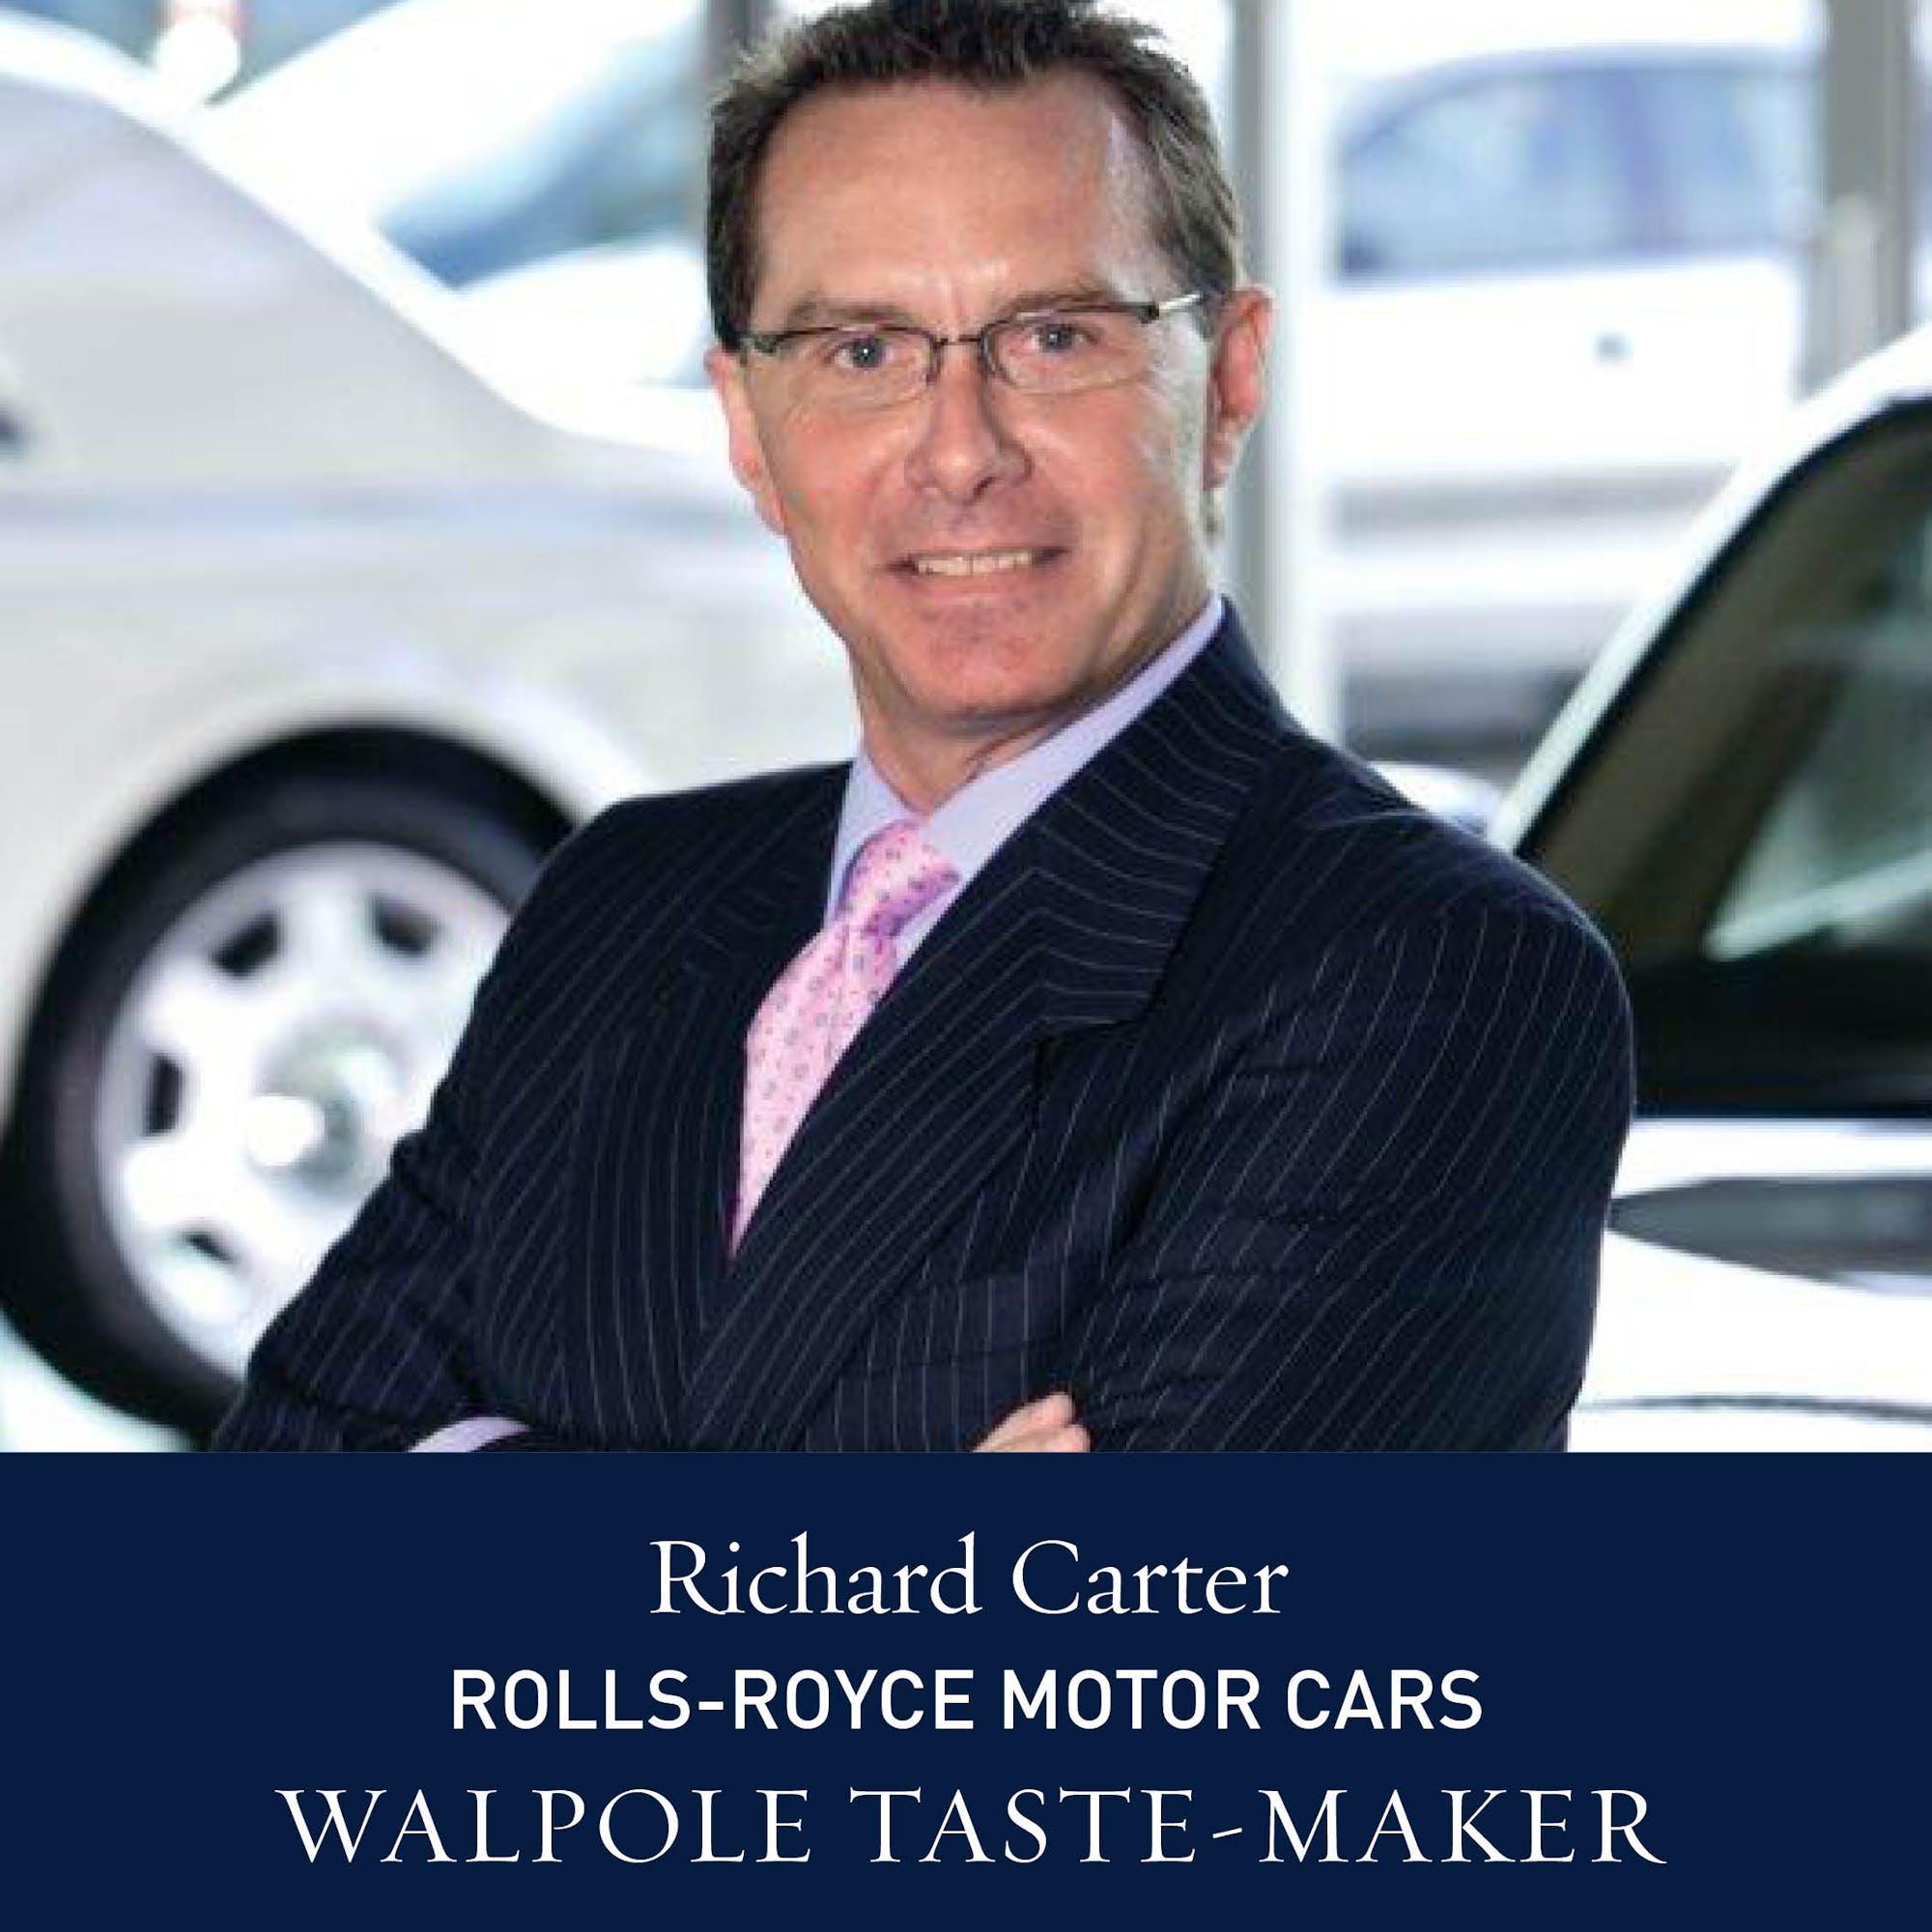 The Walpole Power List 2020  The Taste-Makers: Richard Carter, Director of Global Communications, Rolls-Royce Motor Cars